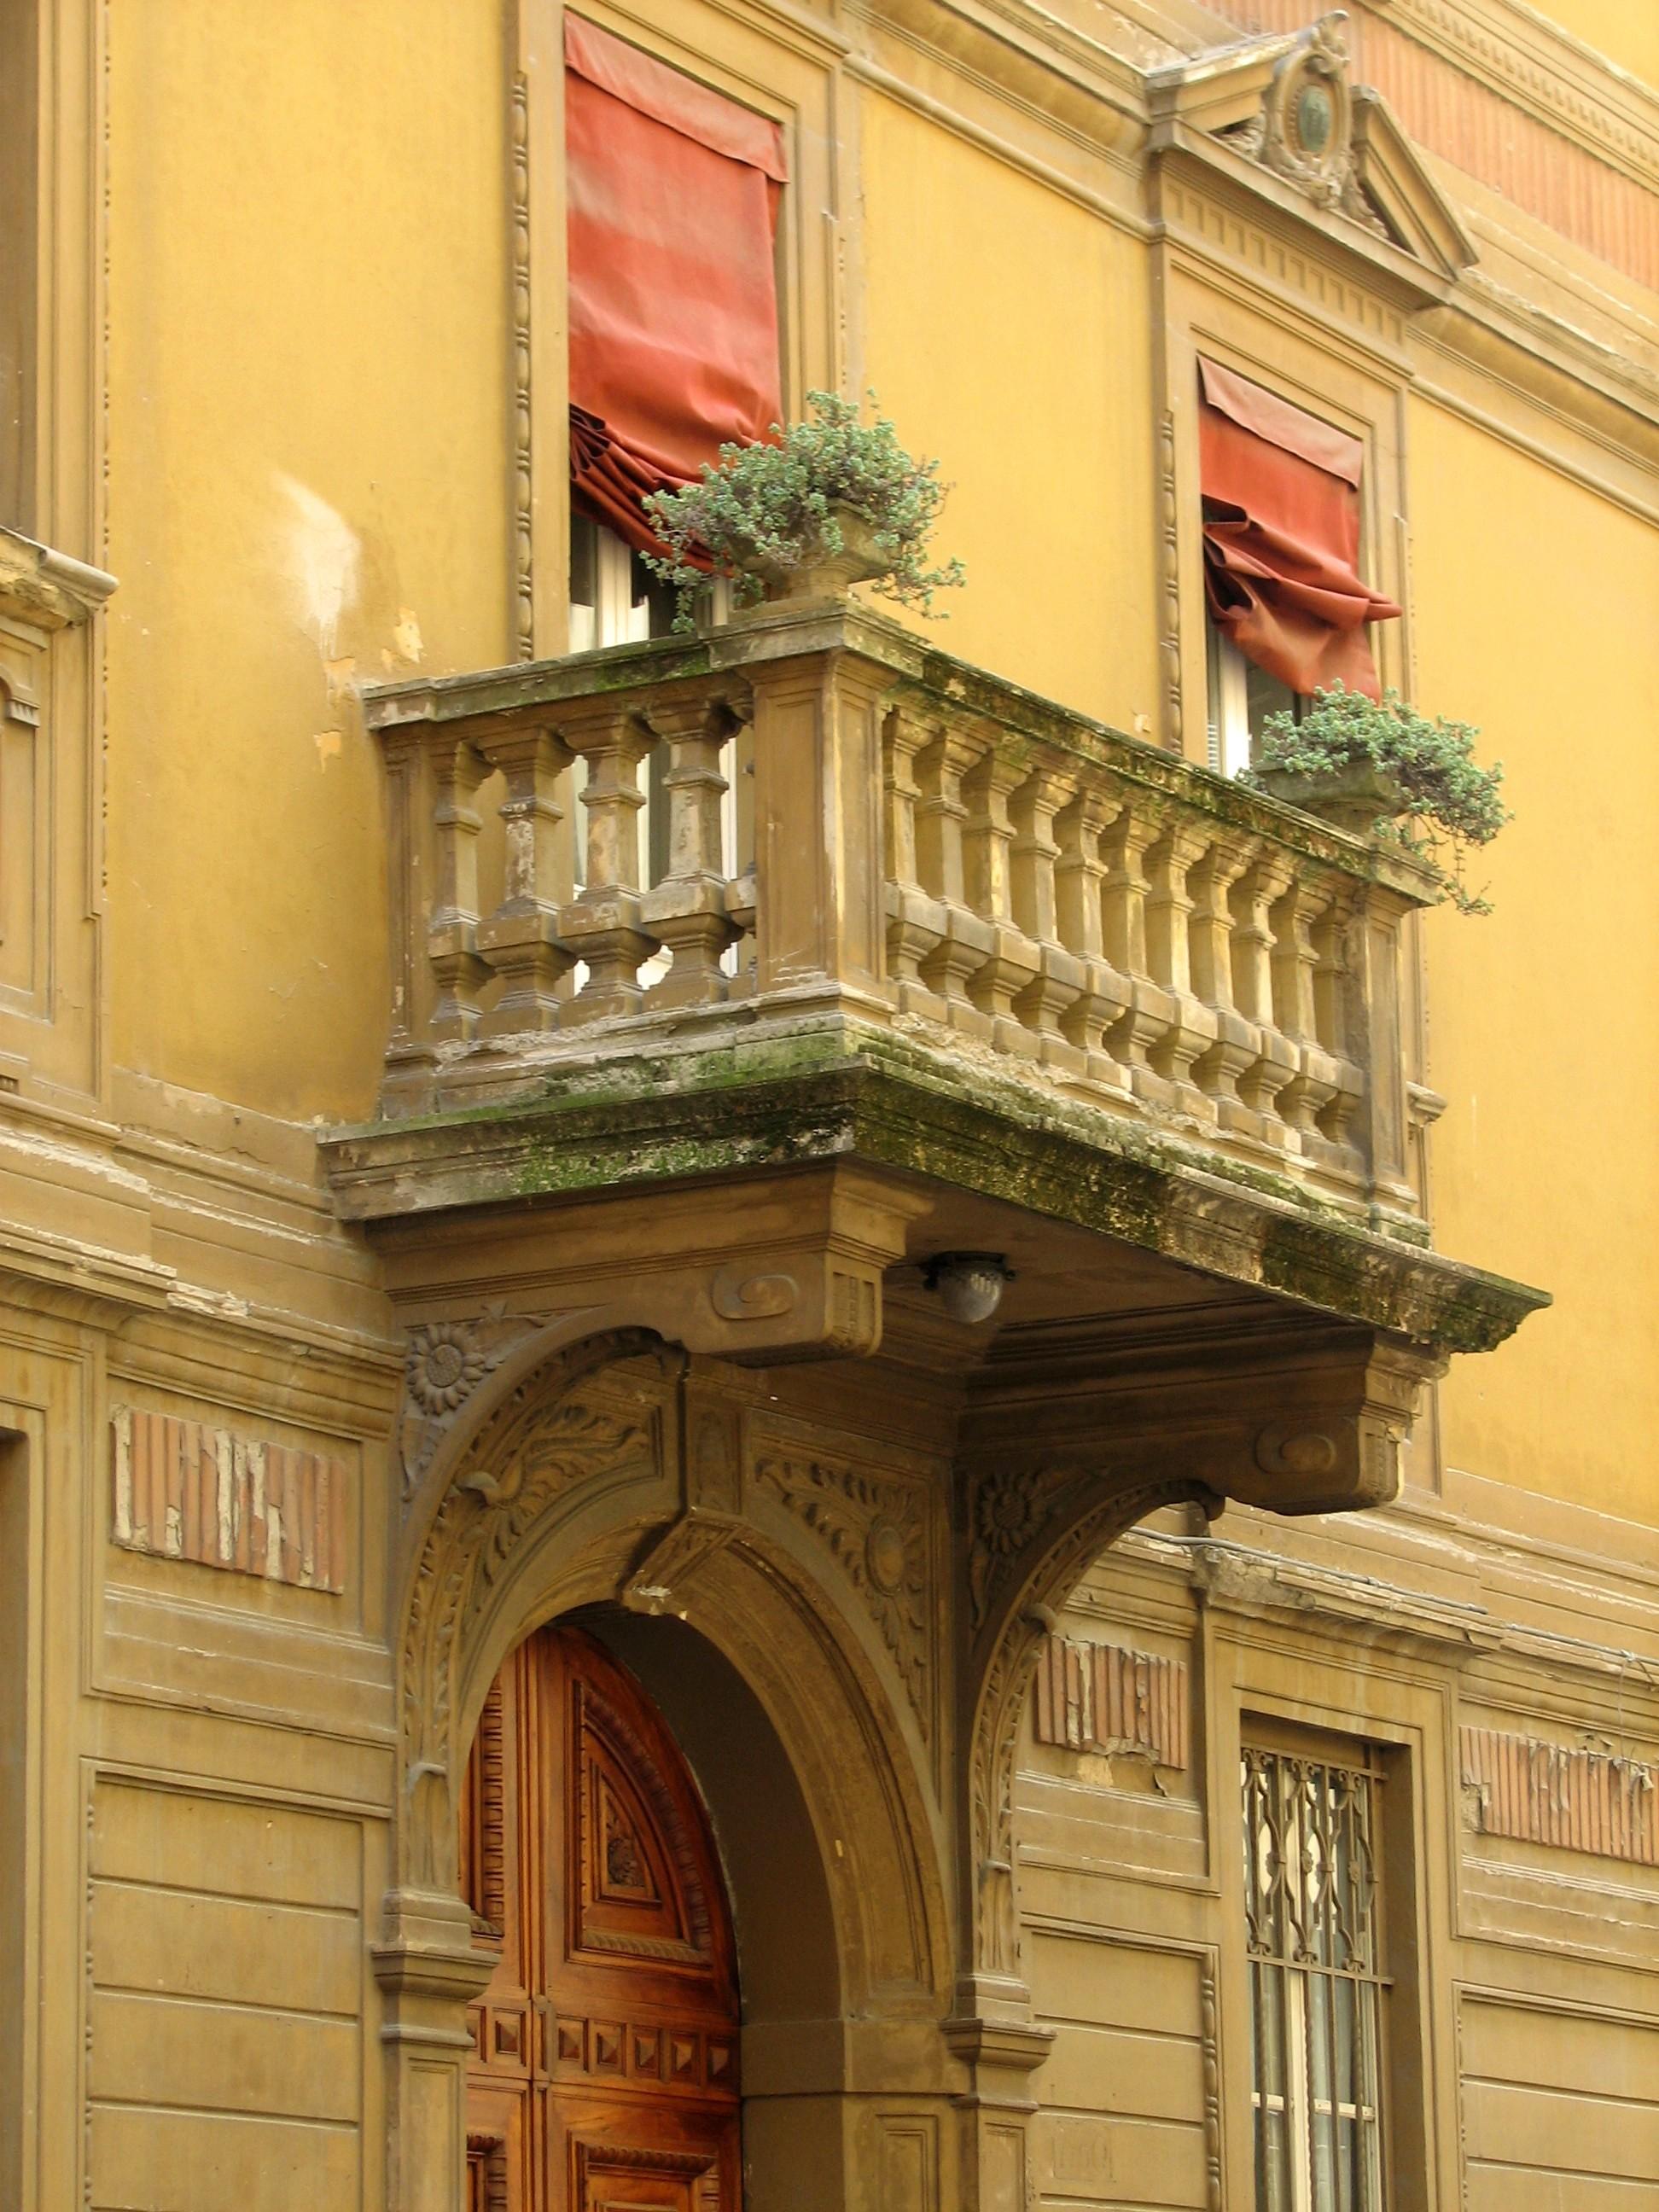 Bologna Balcony.jpg